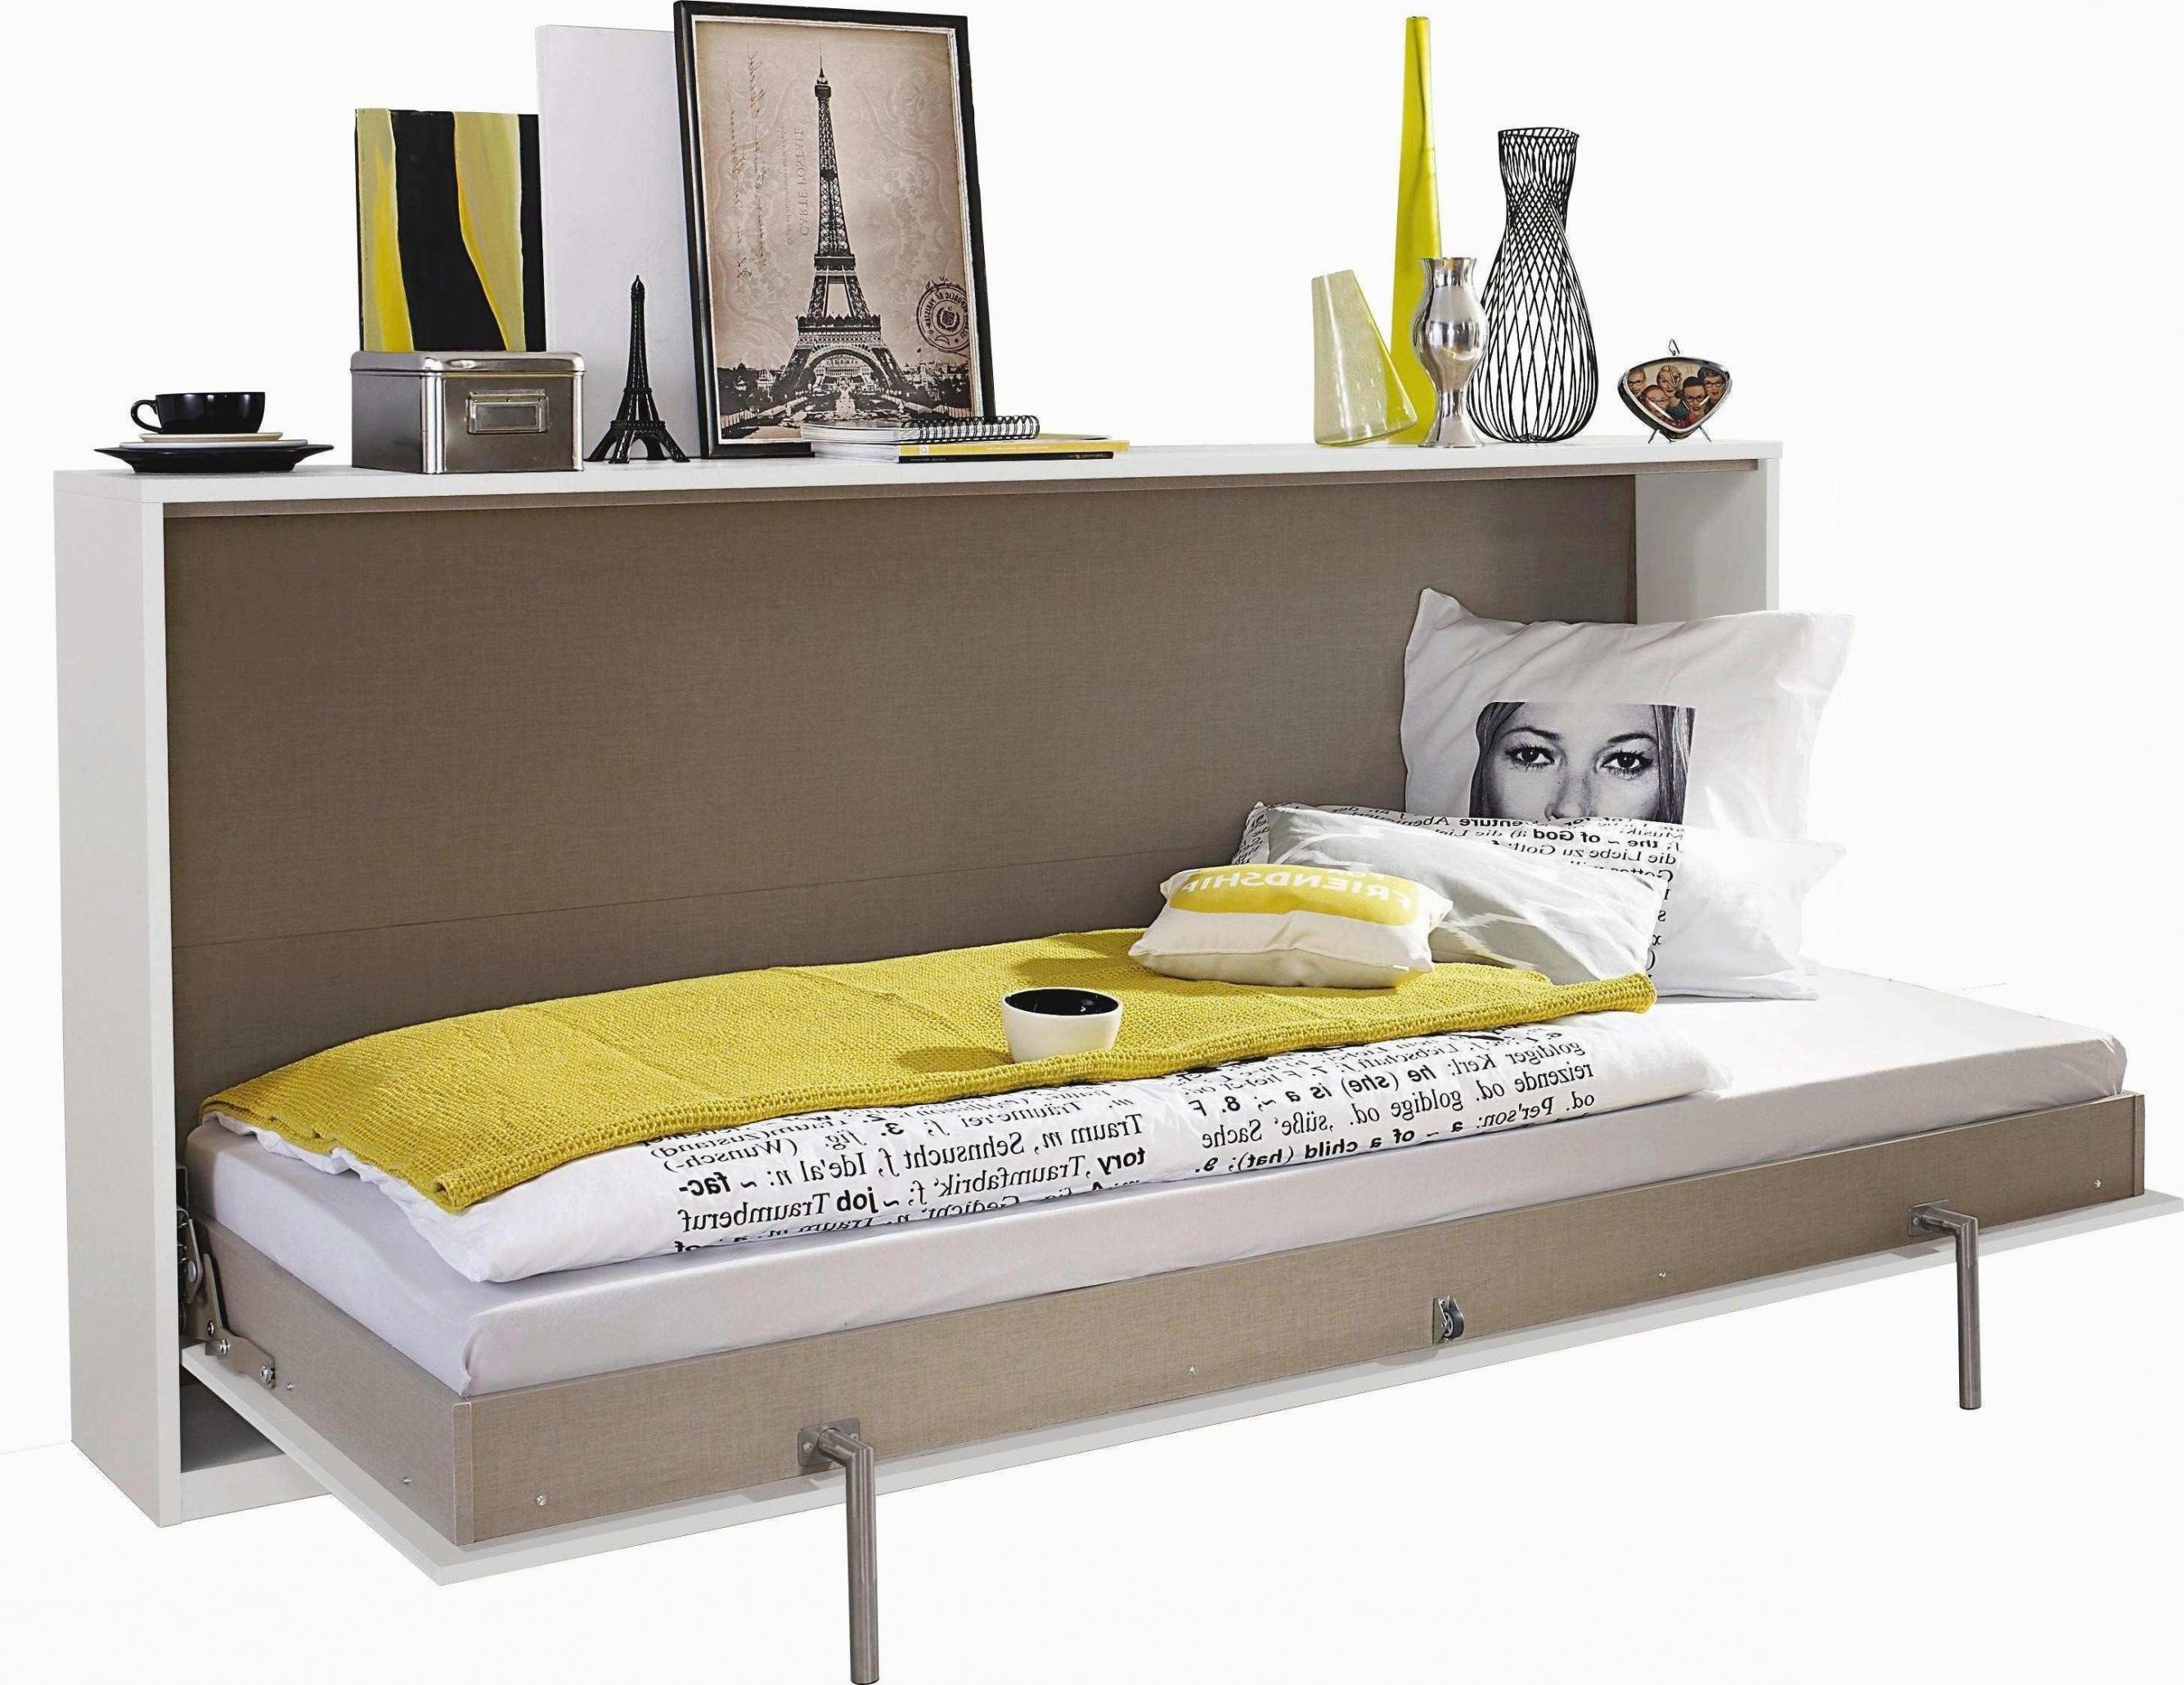 Sillon Hinchable Carrefour Q0d4 sofa Hinchable Carrefour Nuevo Table A Langer Avec Baignoire